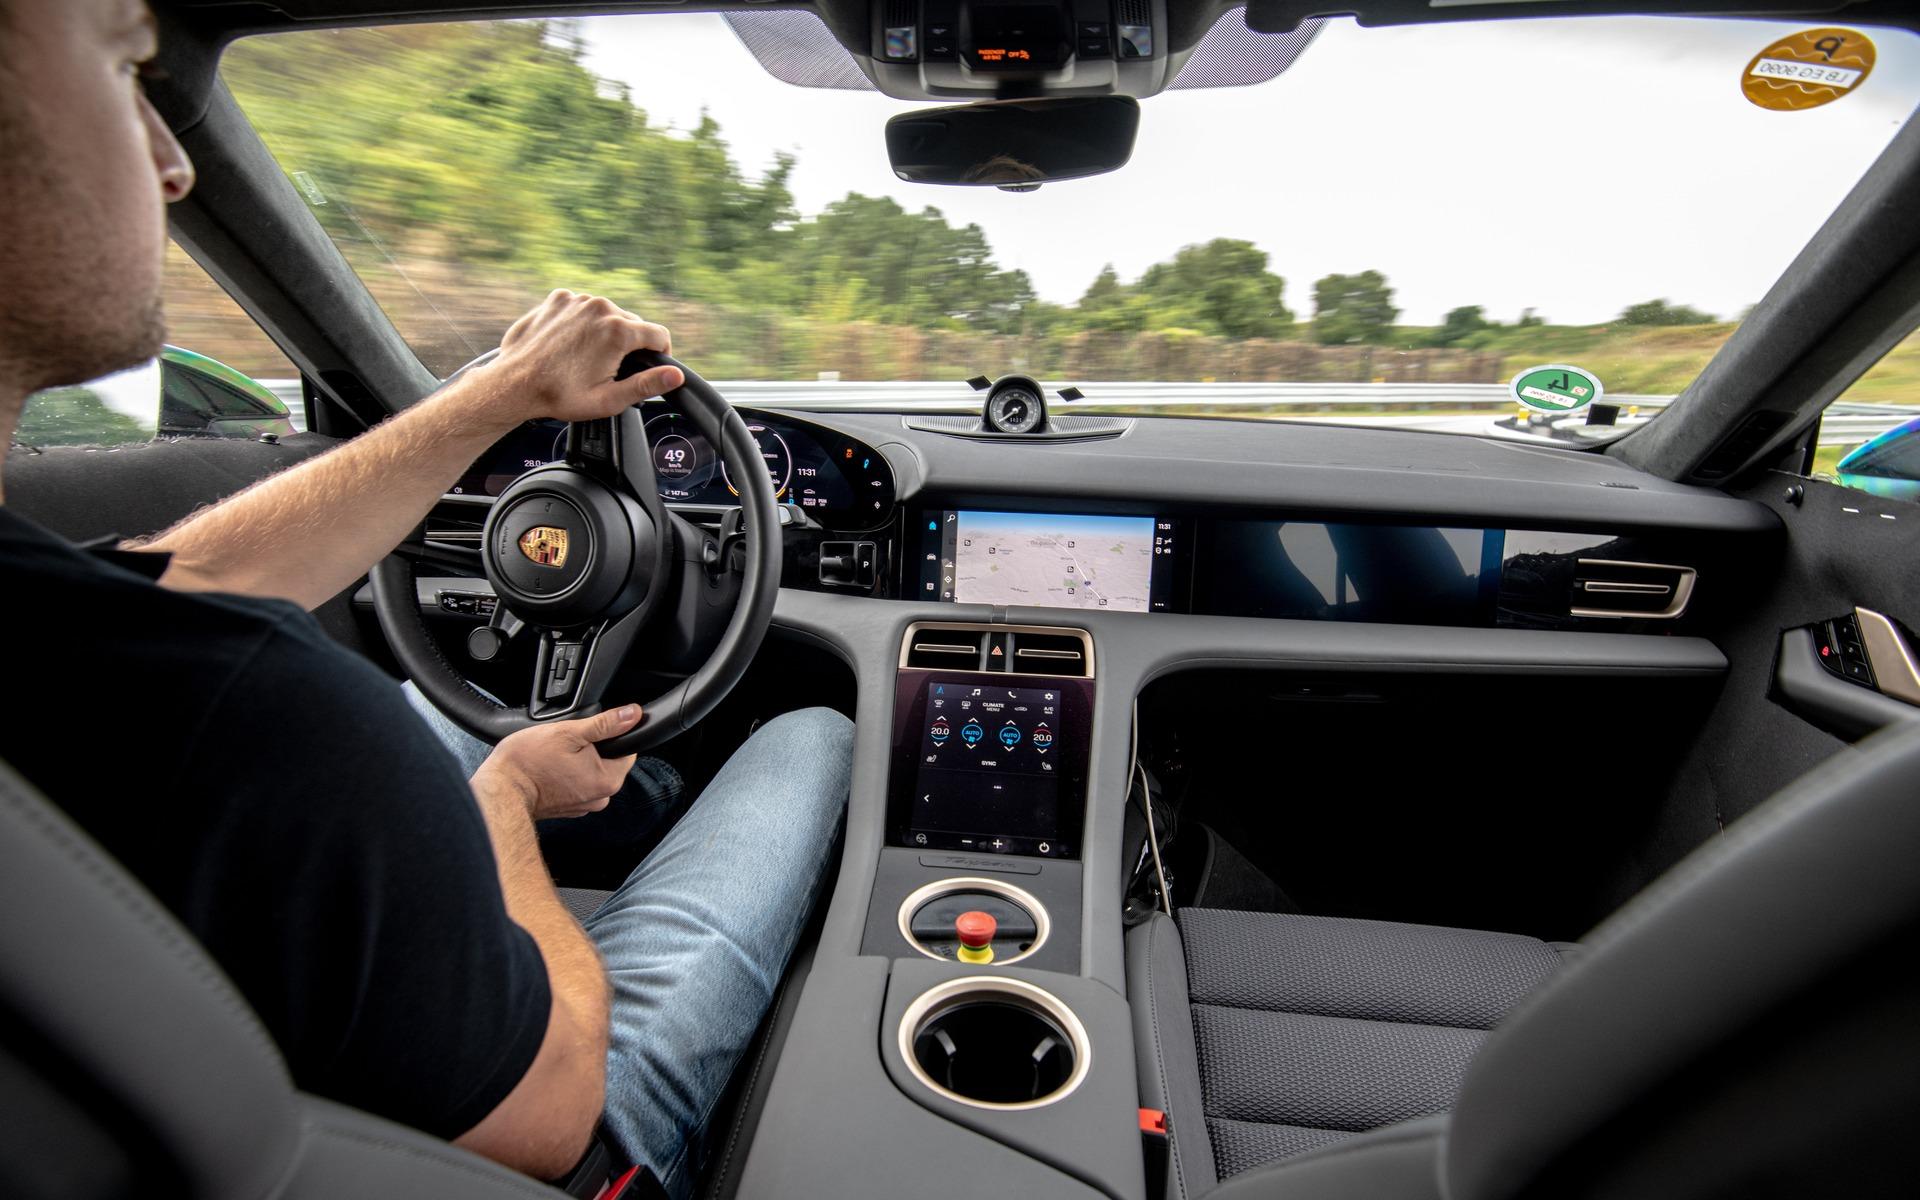 All-electric Porsche Taycan Ushers in a New Era at Porsche